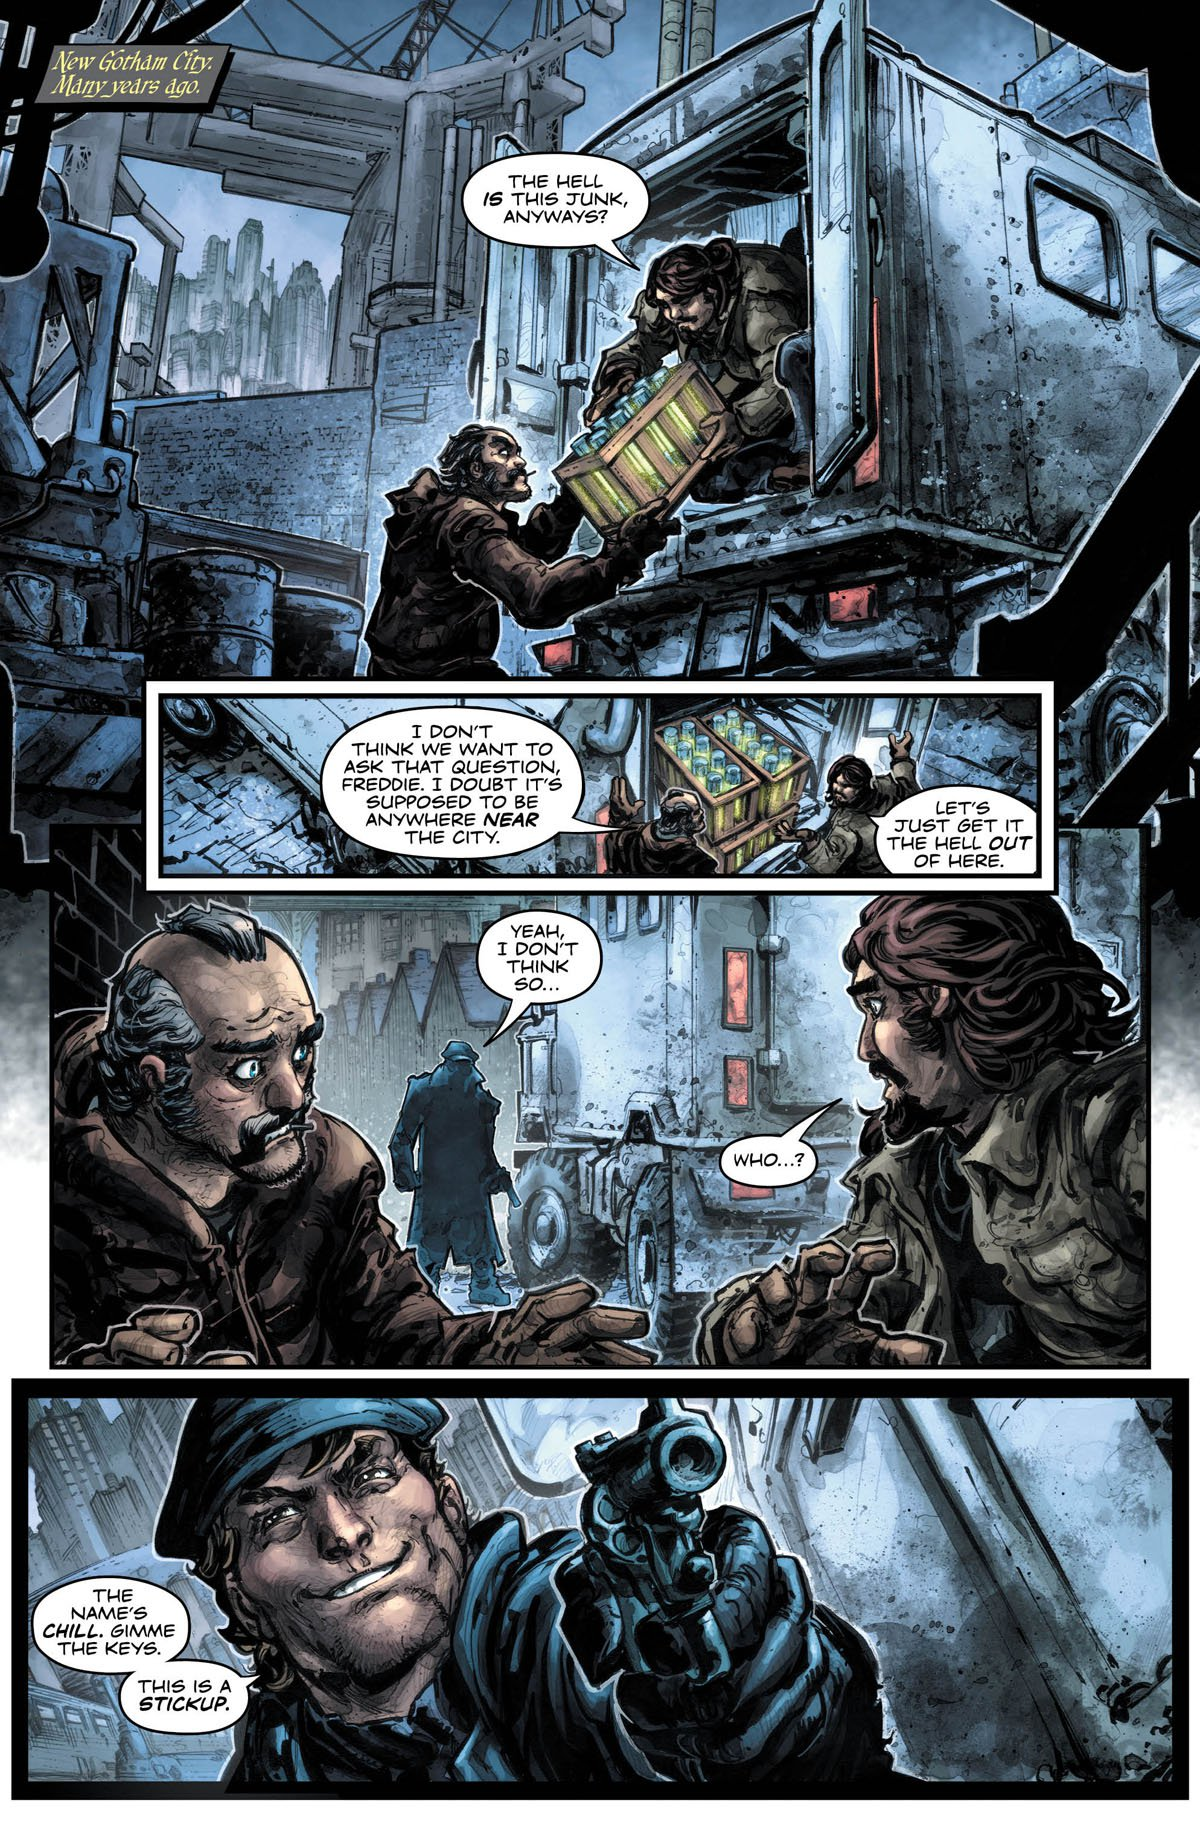 batman-tmnt-iii-issue-3-page-1.jpg